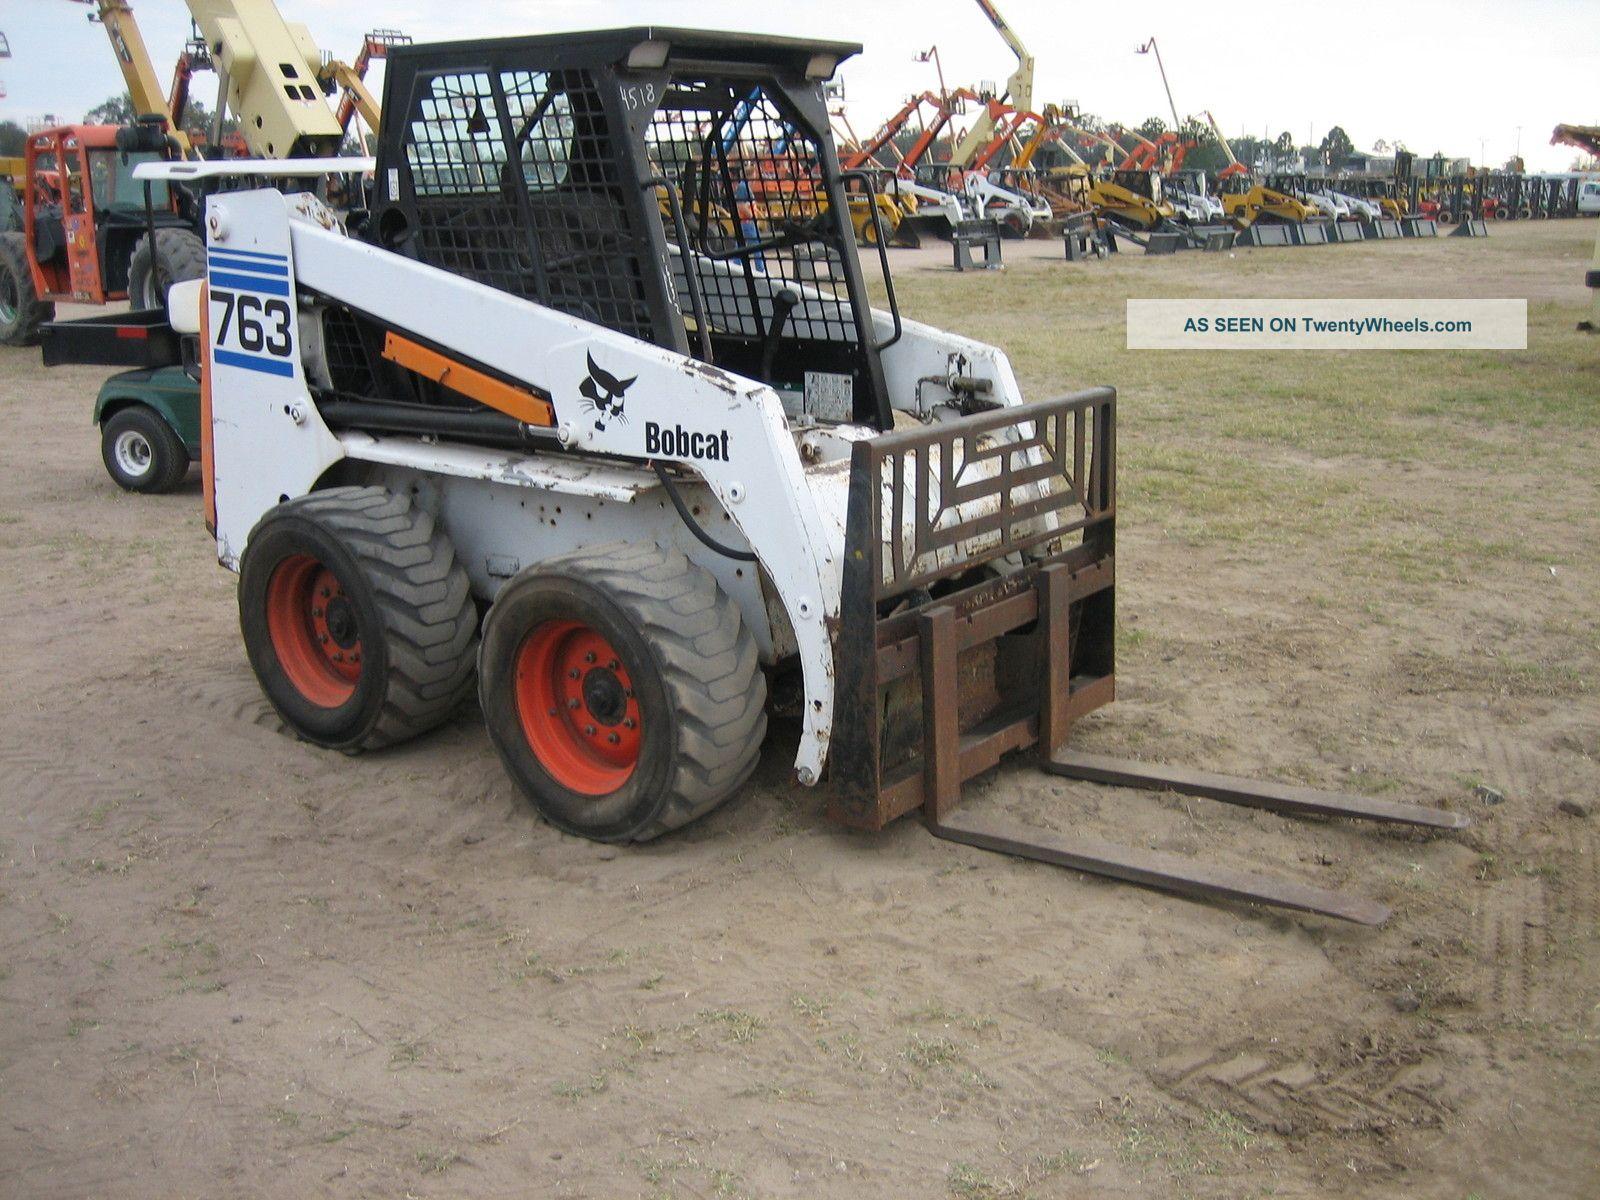 1999 Bobcat 763 Rubber Tire Skidsteer Diesel Machine With